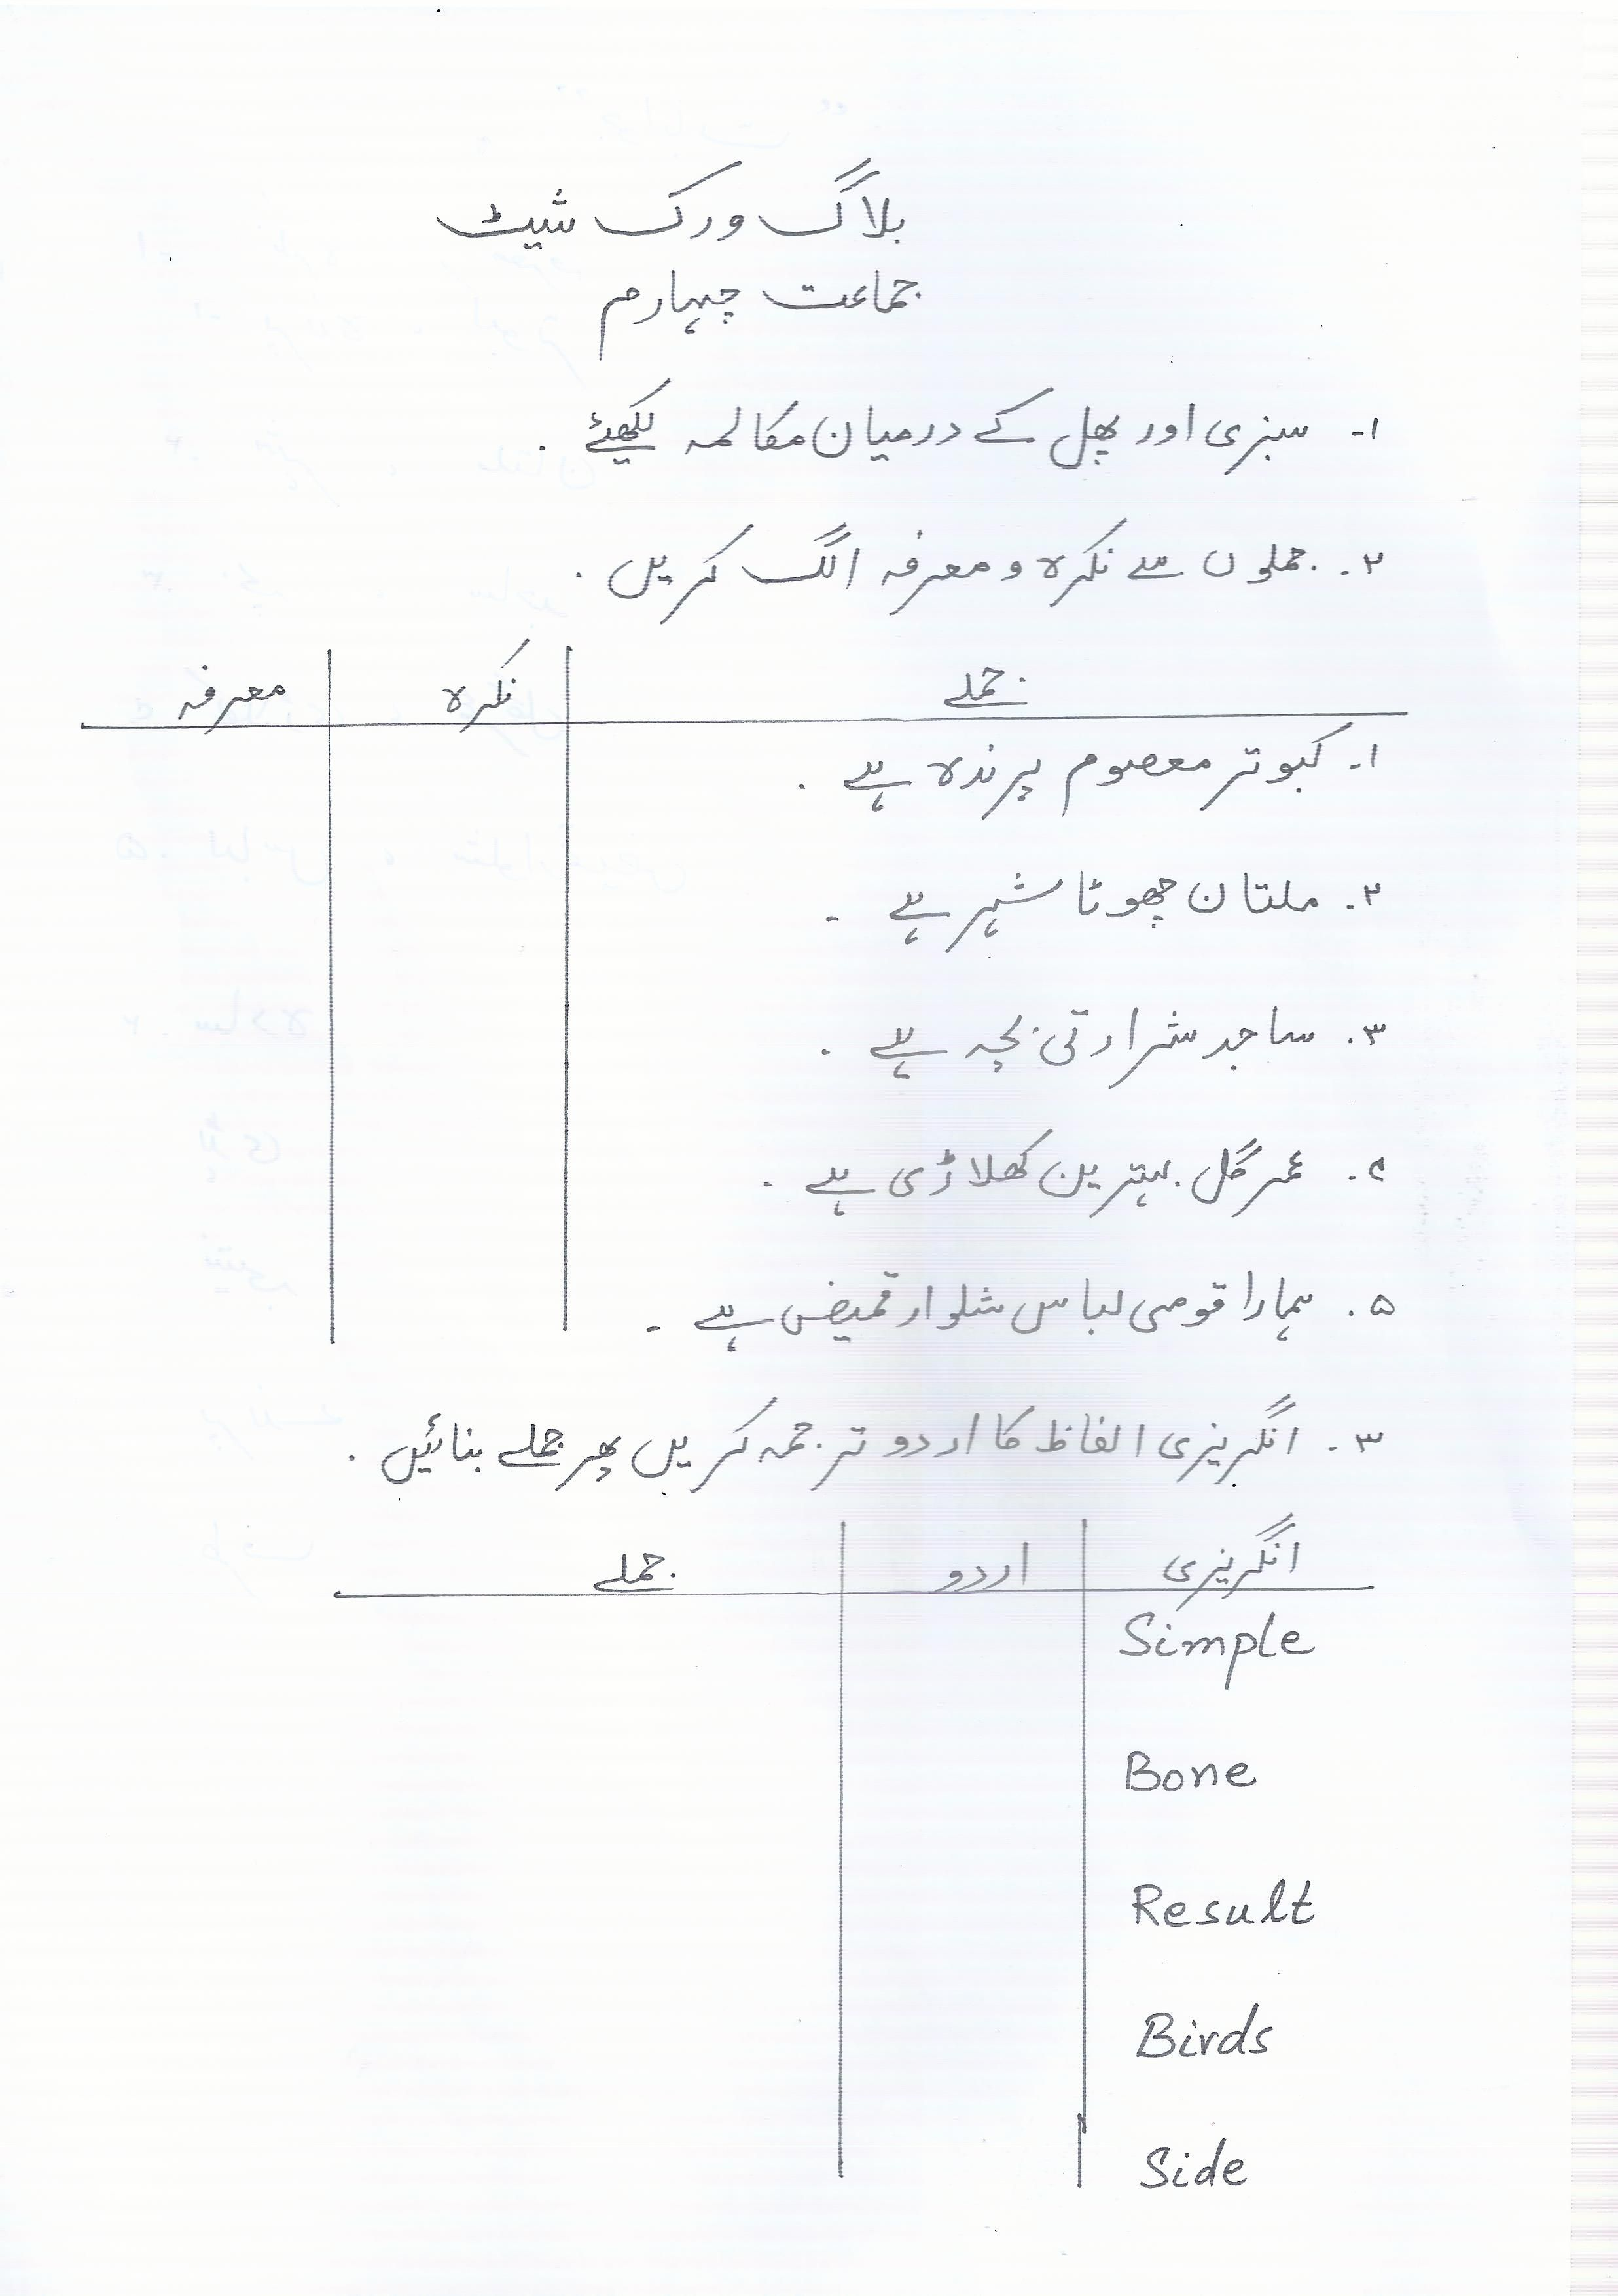 hight resolution of urdu-bw-year-4-1-of-22.jpg (2472×3507)   Reading comprehension worksheets